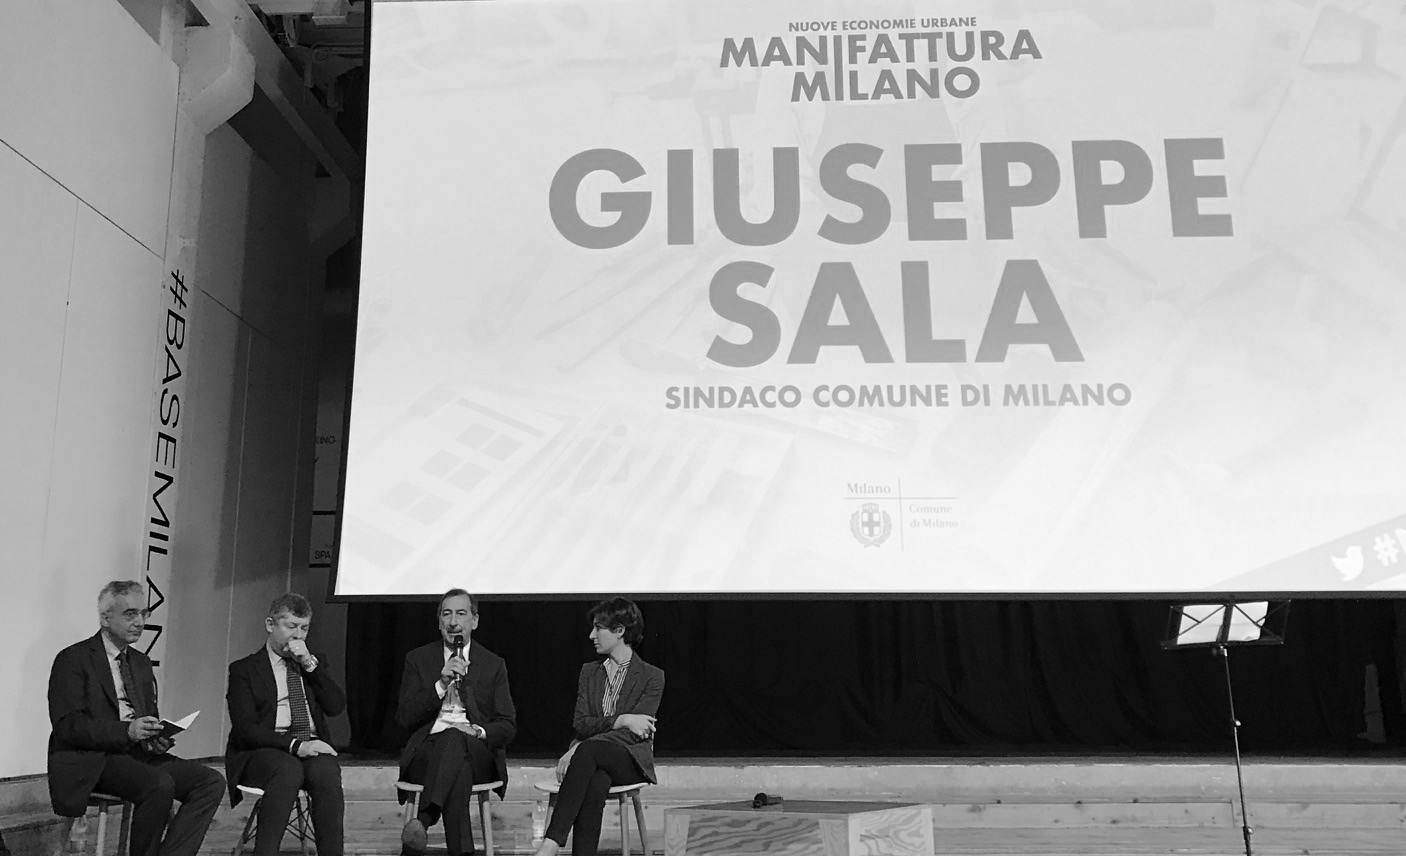 Sindaco Giuseppe Sala manifattura milano